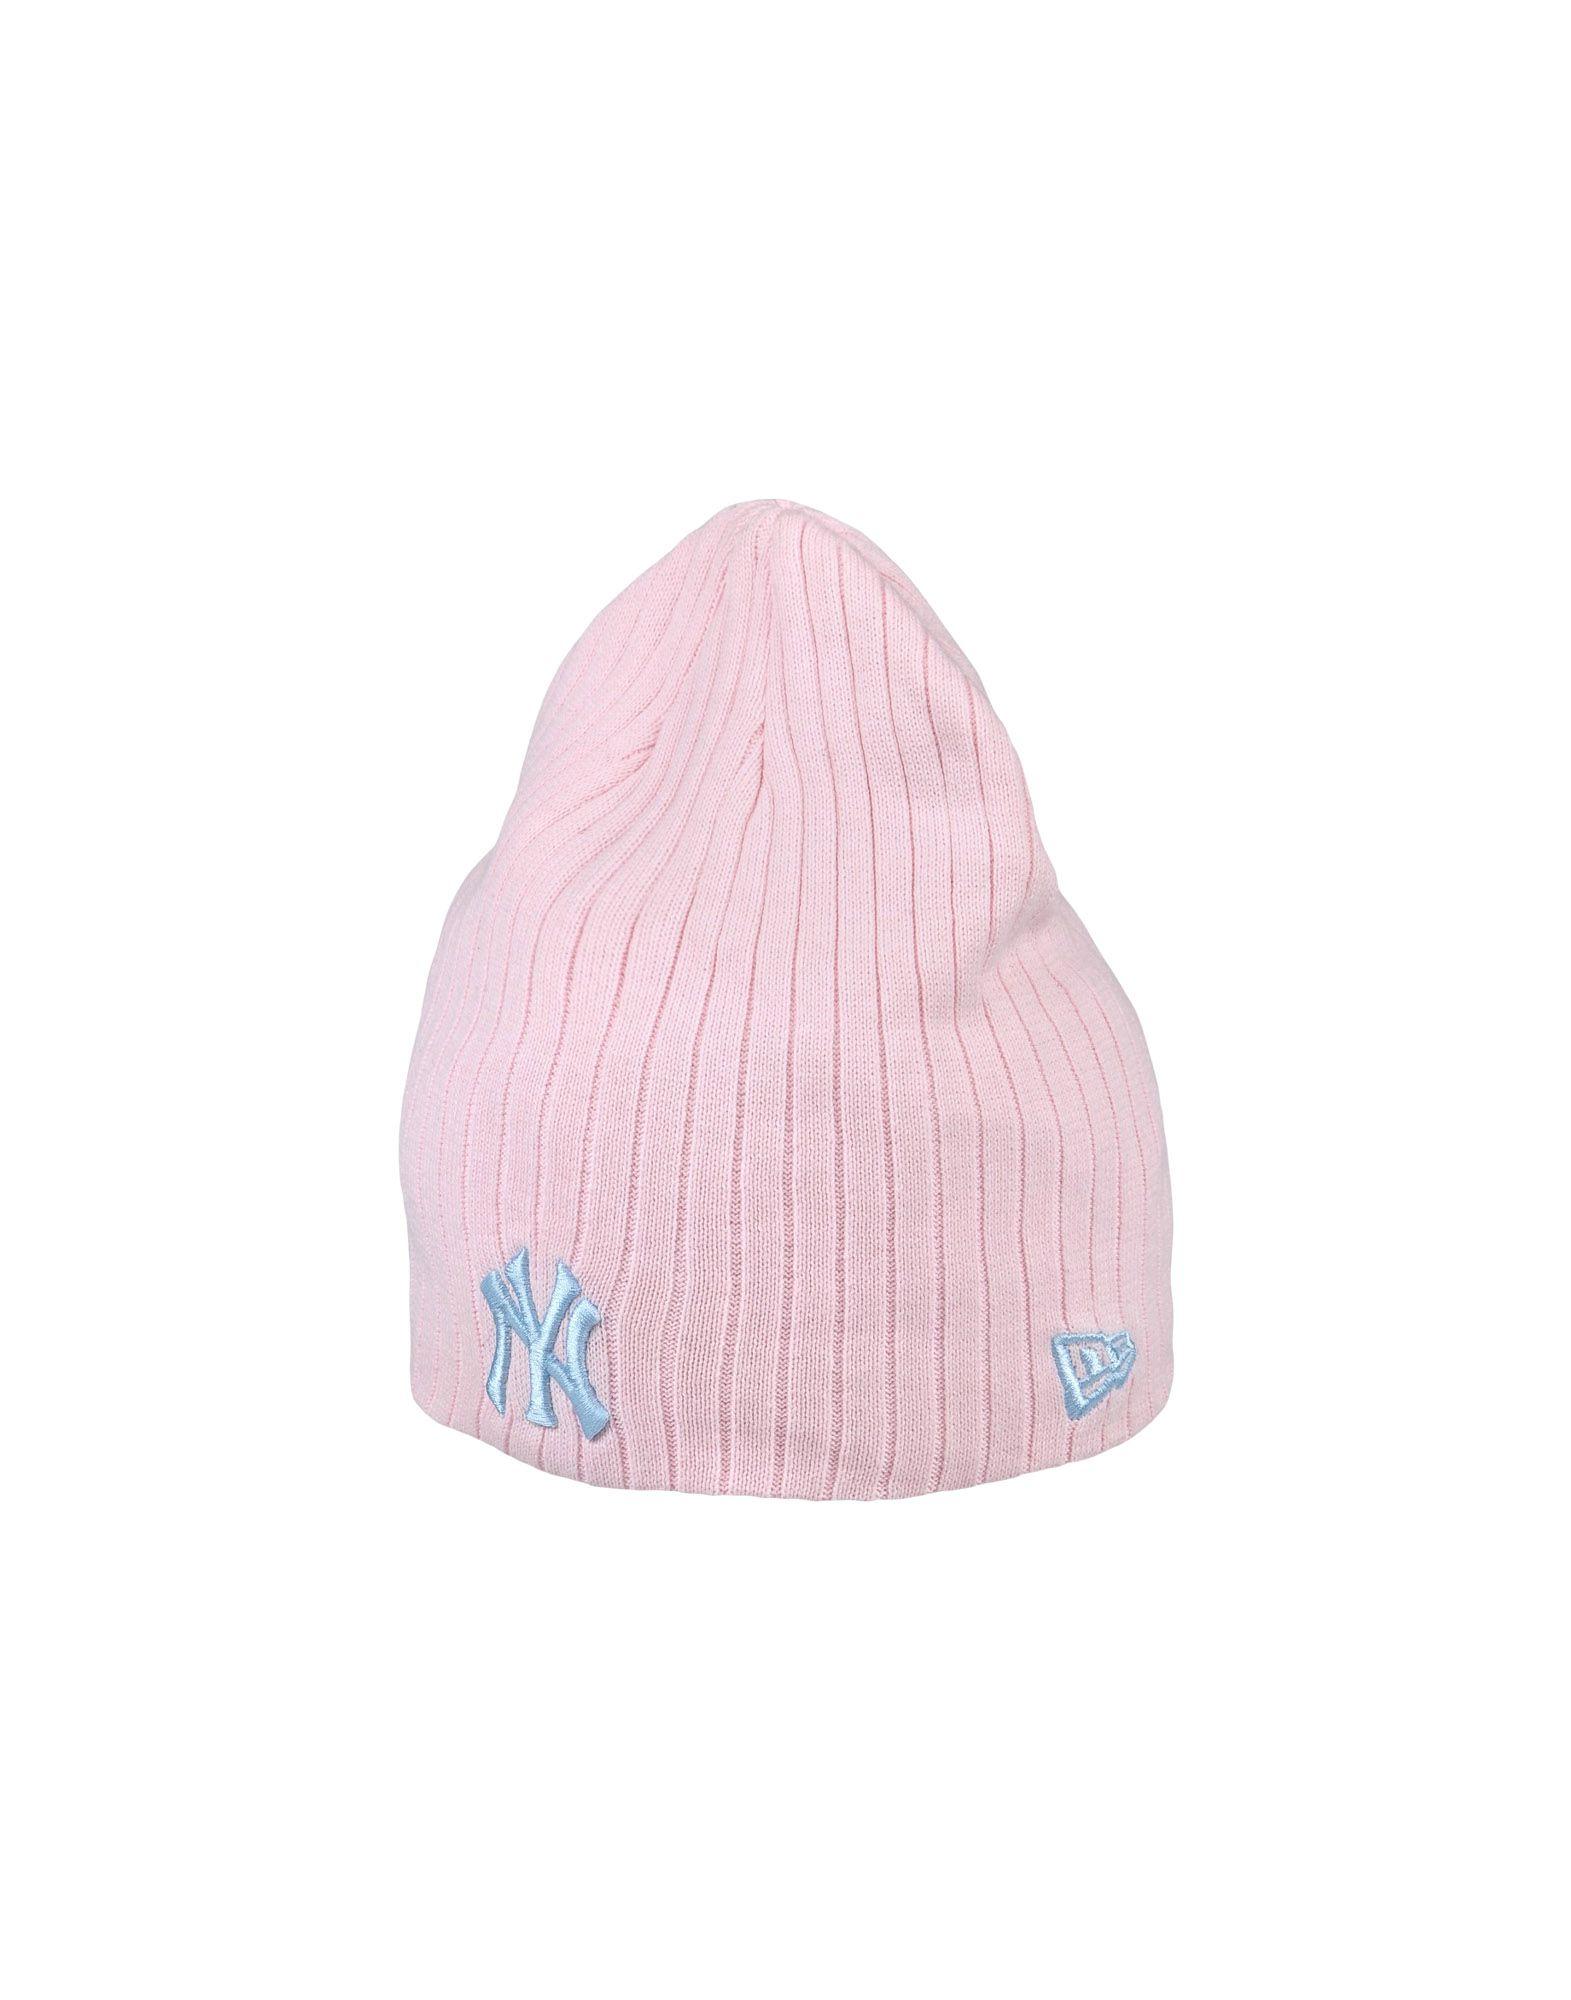 MAJOR LEAGUE BASEBALL Головной убор unisex men women m embroidery snapback hats hip hop adjustable baseball cap hat